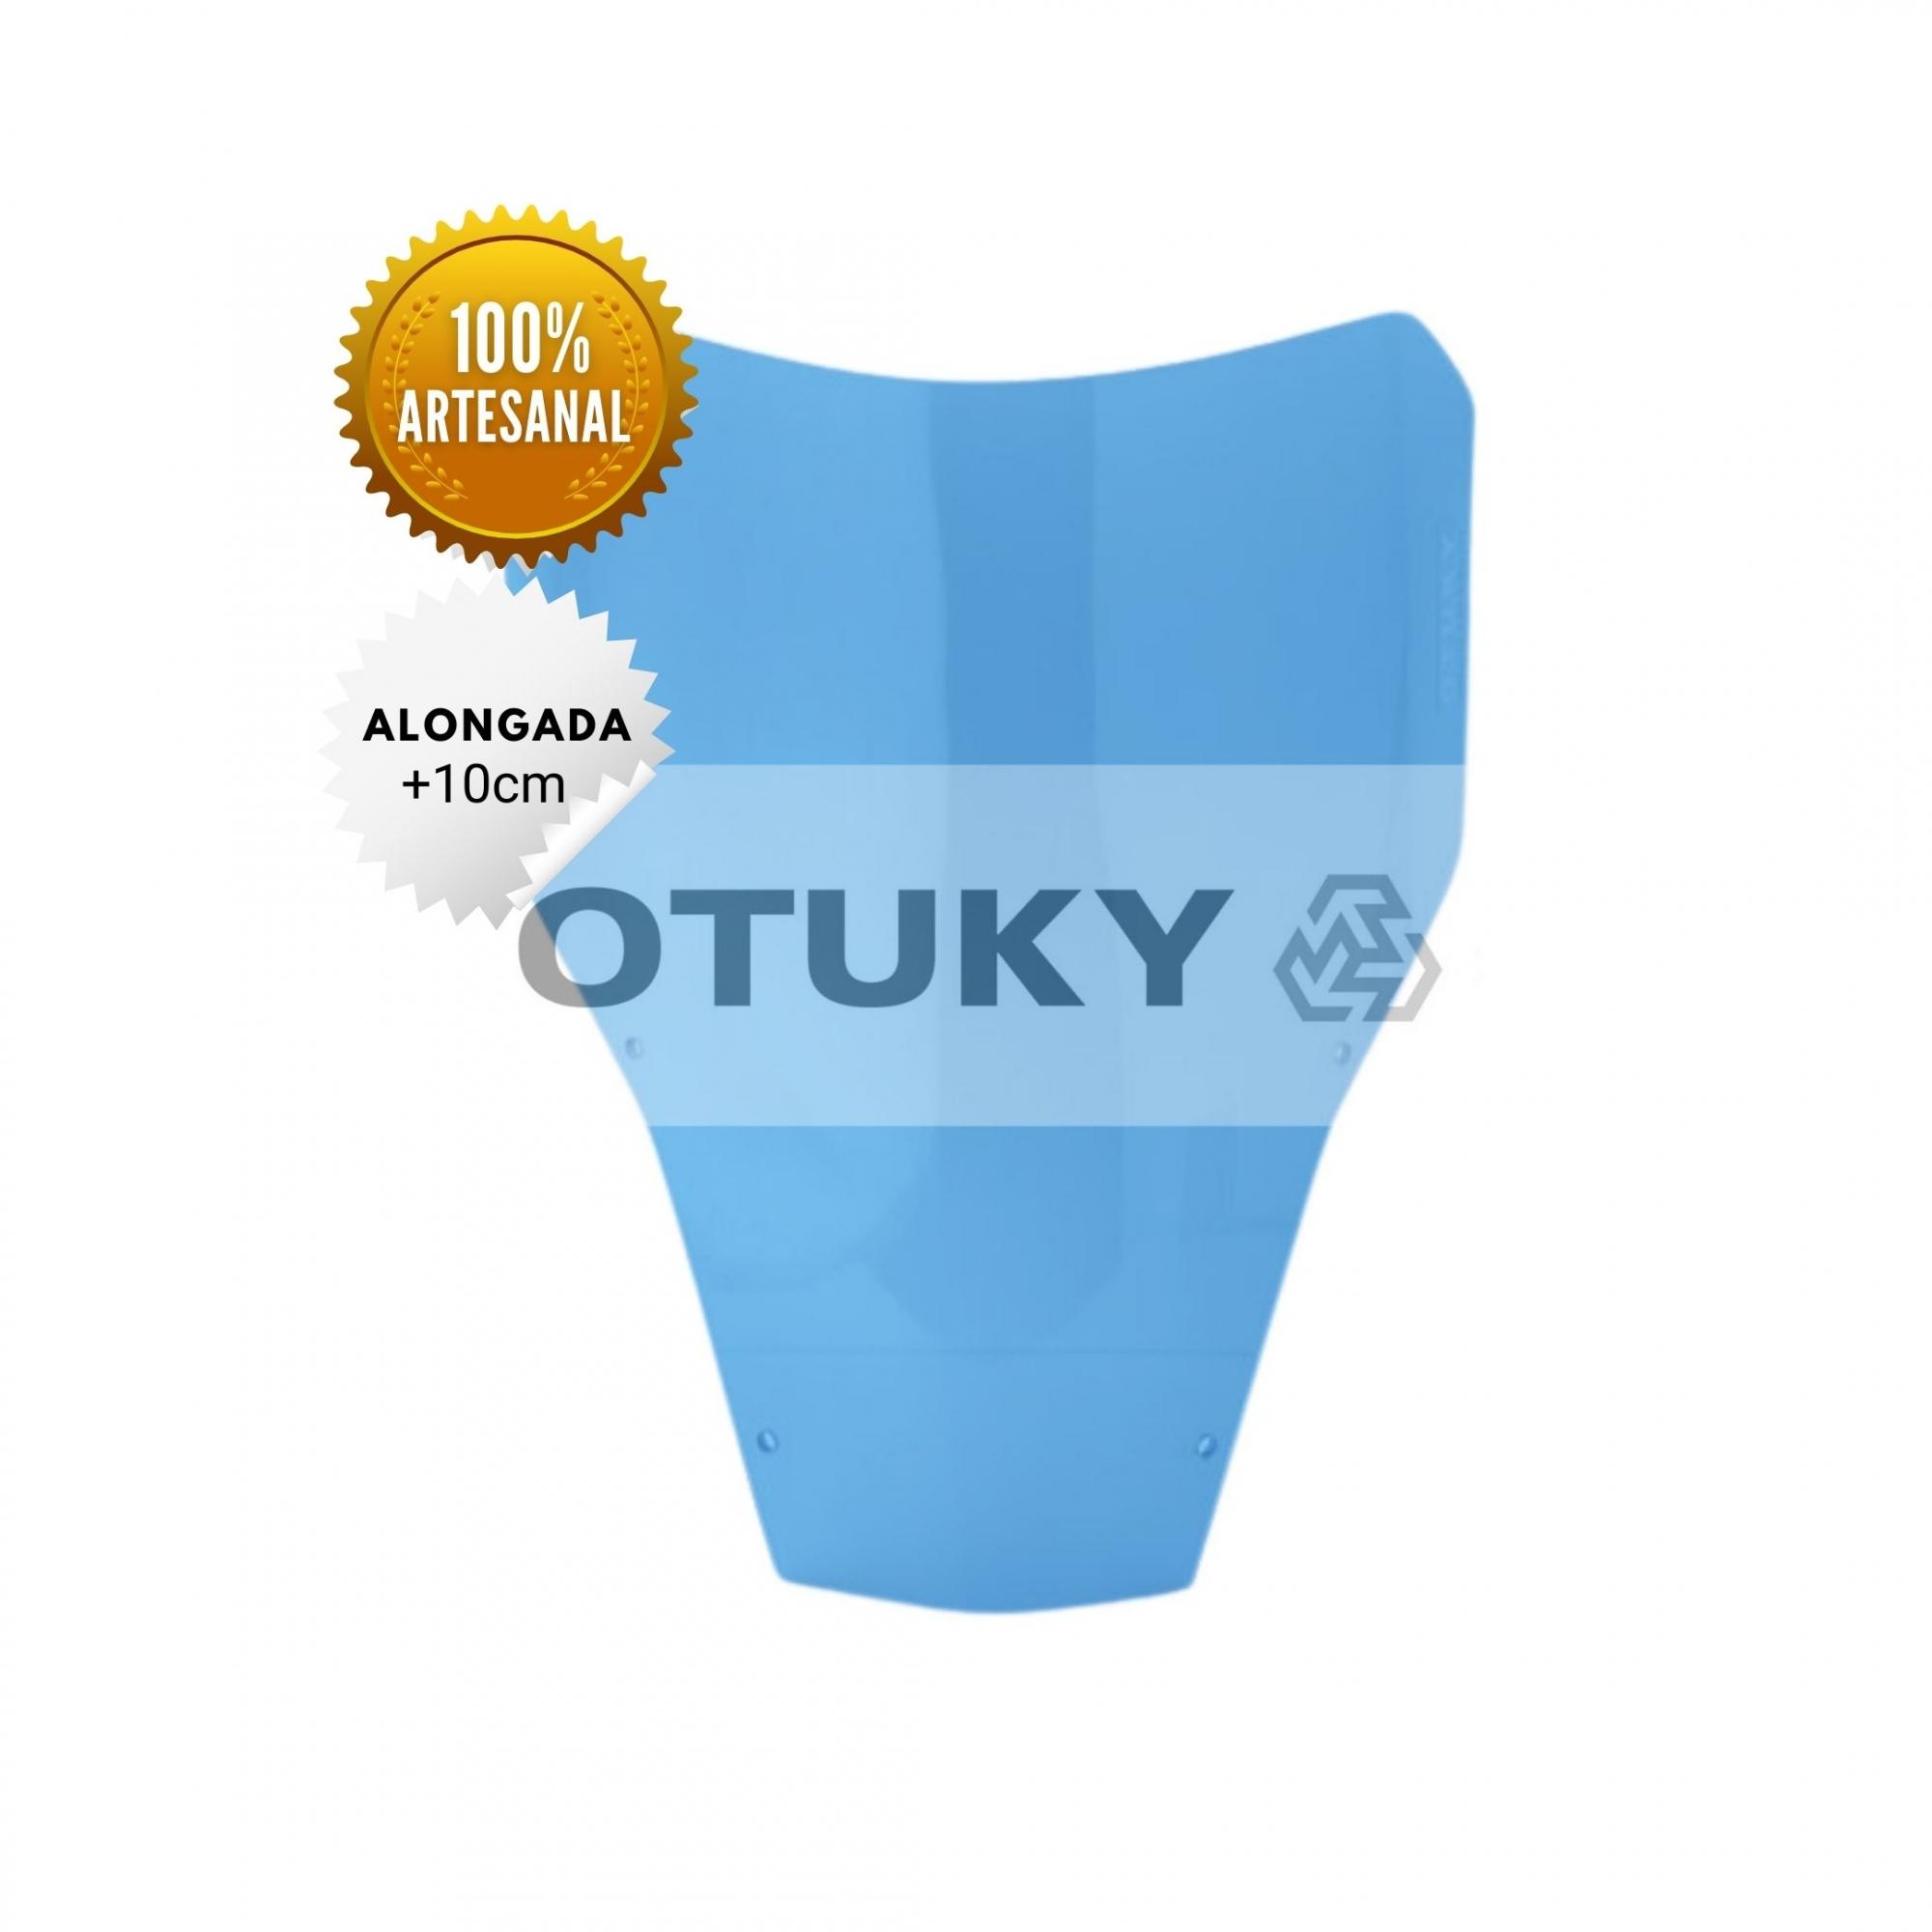 Bolha para Moto XT 660 R 2005 até 2018 Otuky Alongada Azul Claro